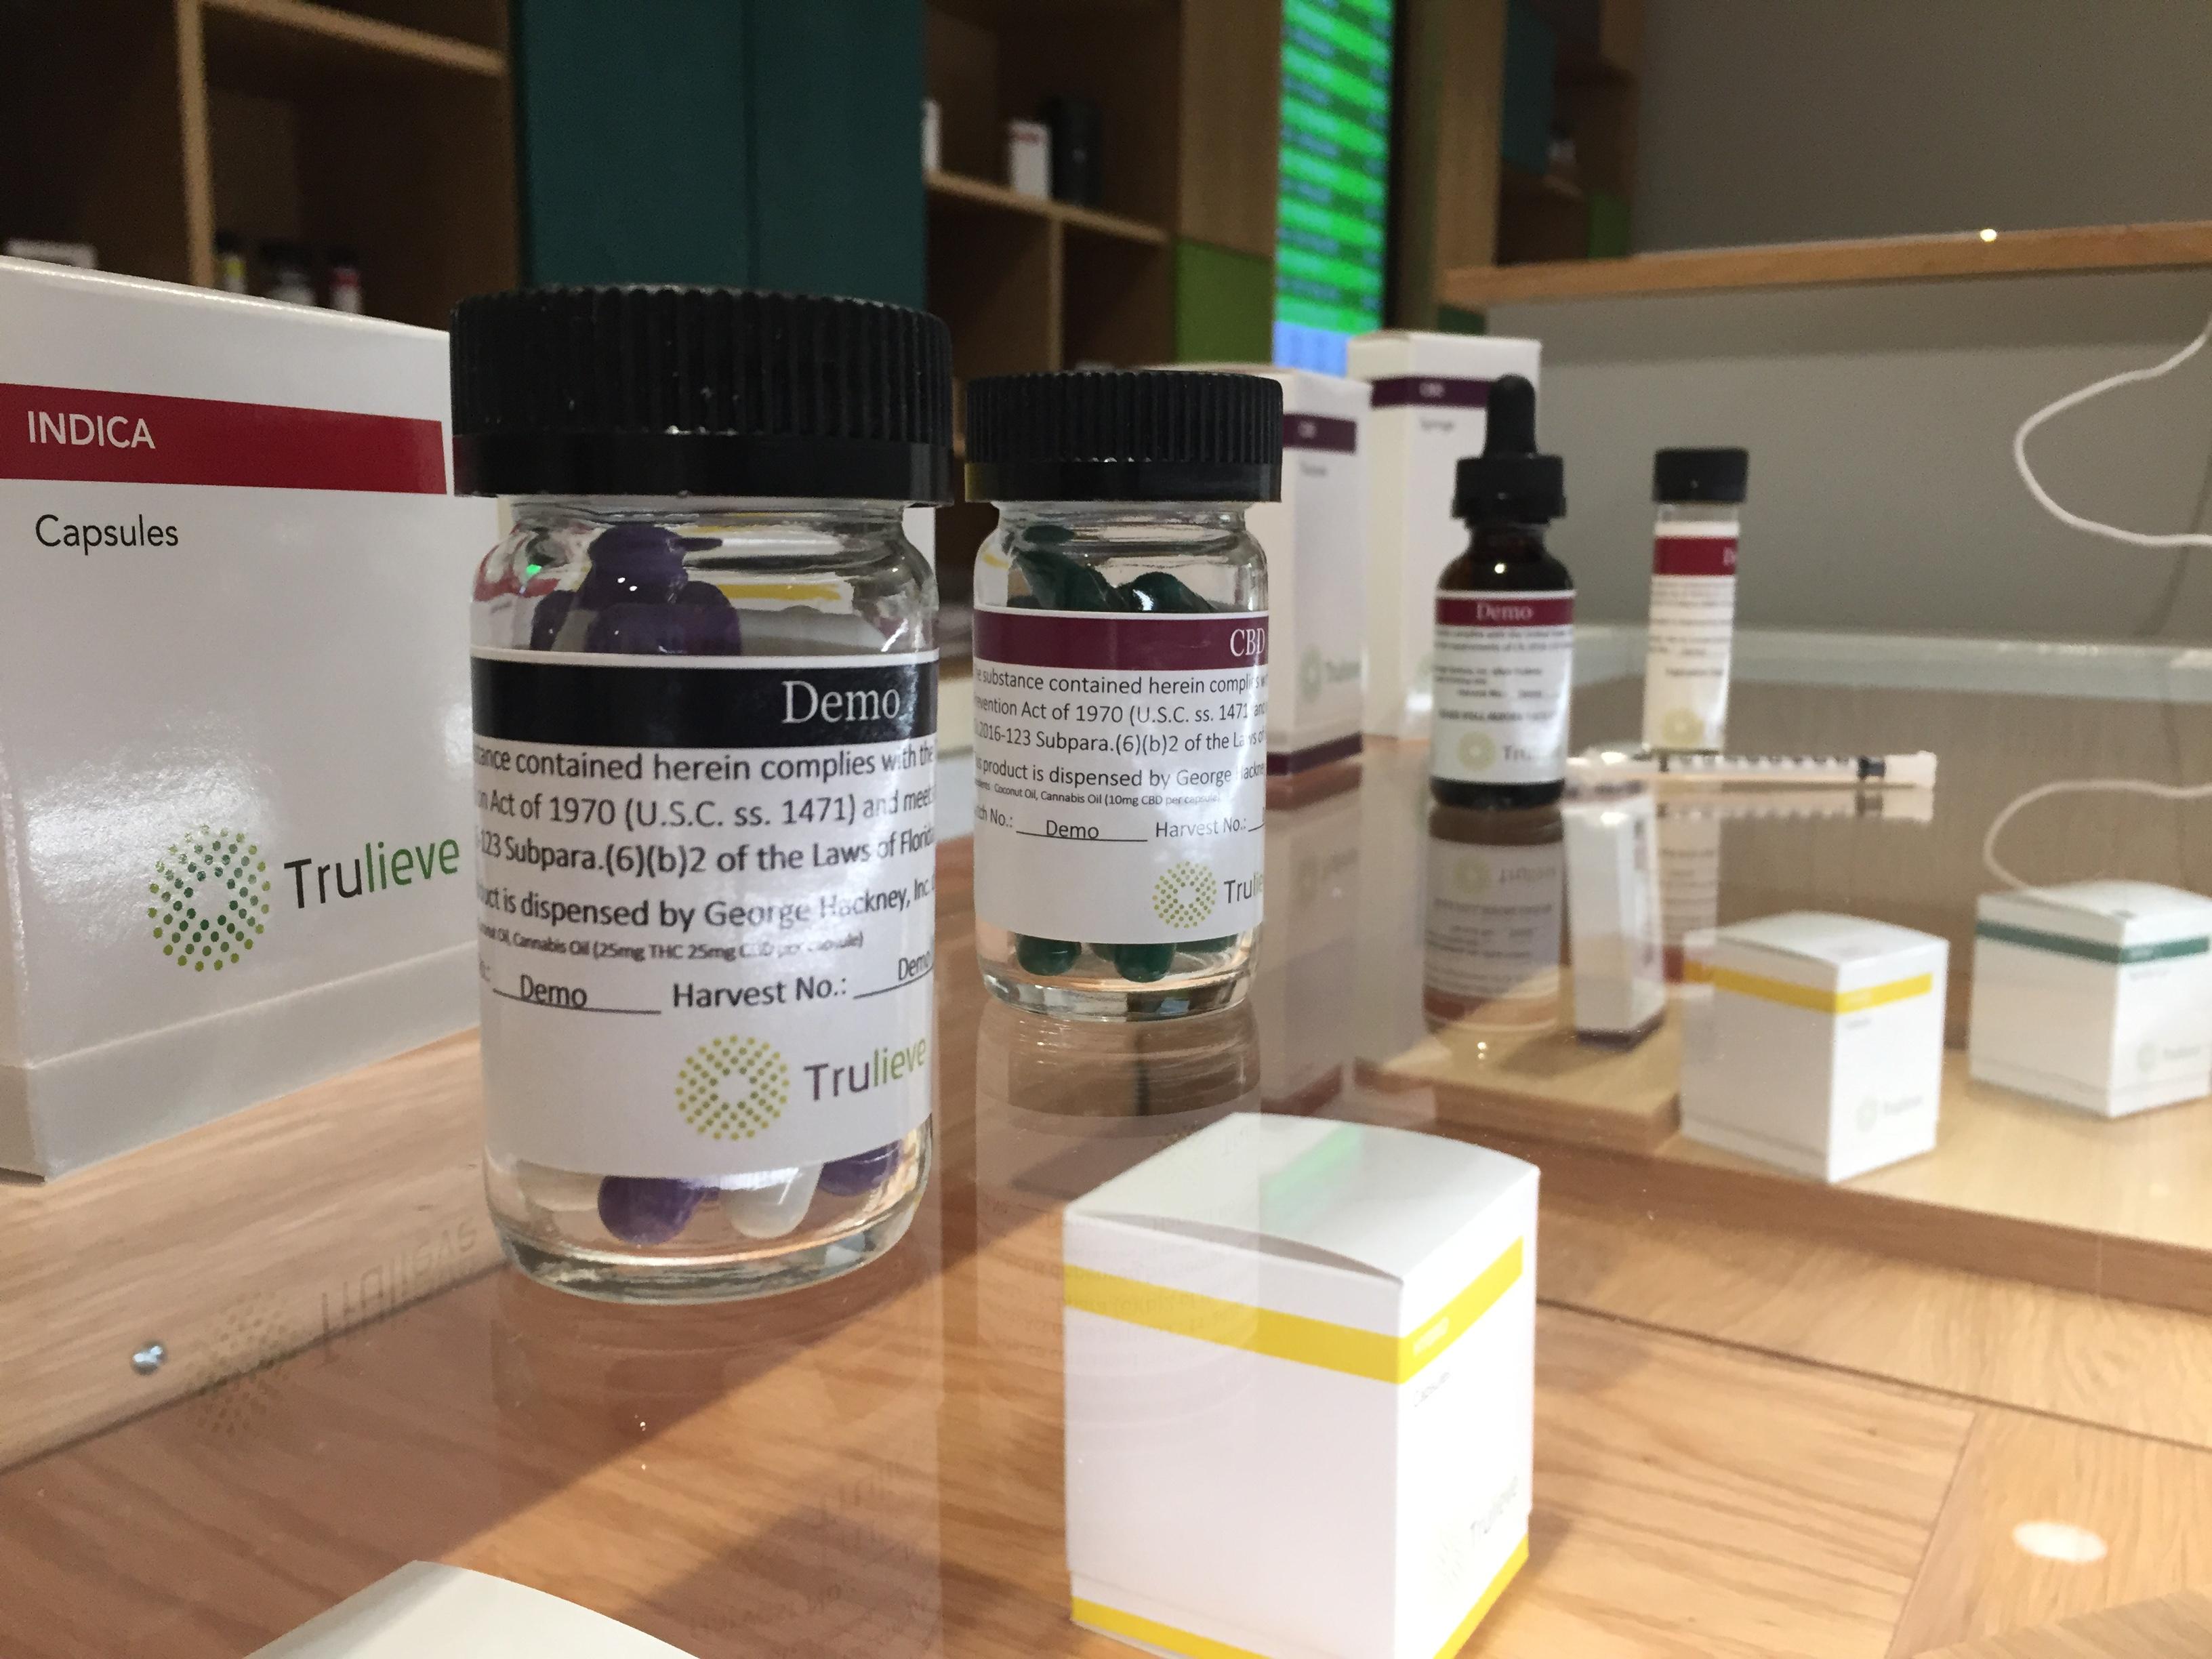 Medical Marijuana Dispensary Opens in Pensacola Wednesday